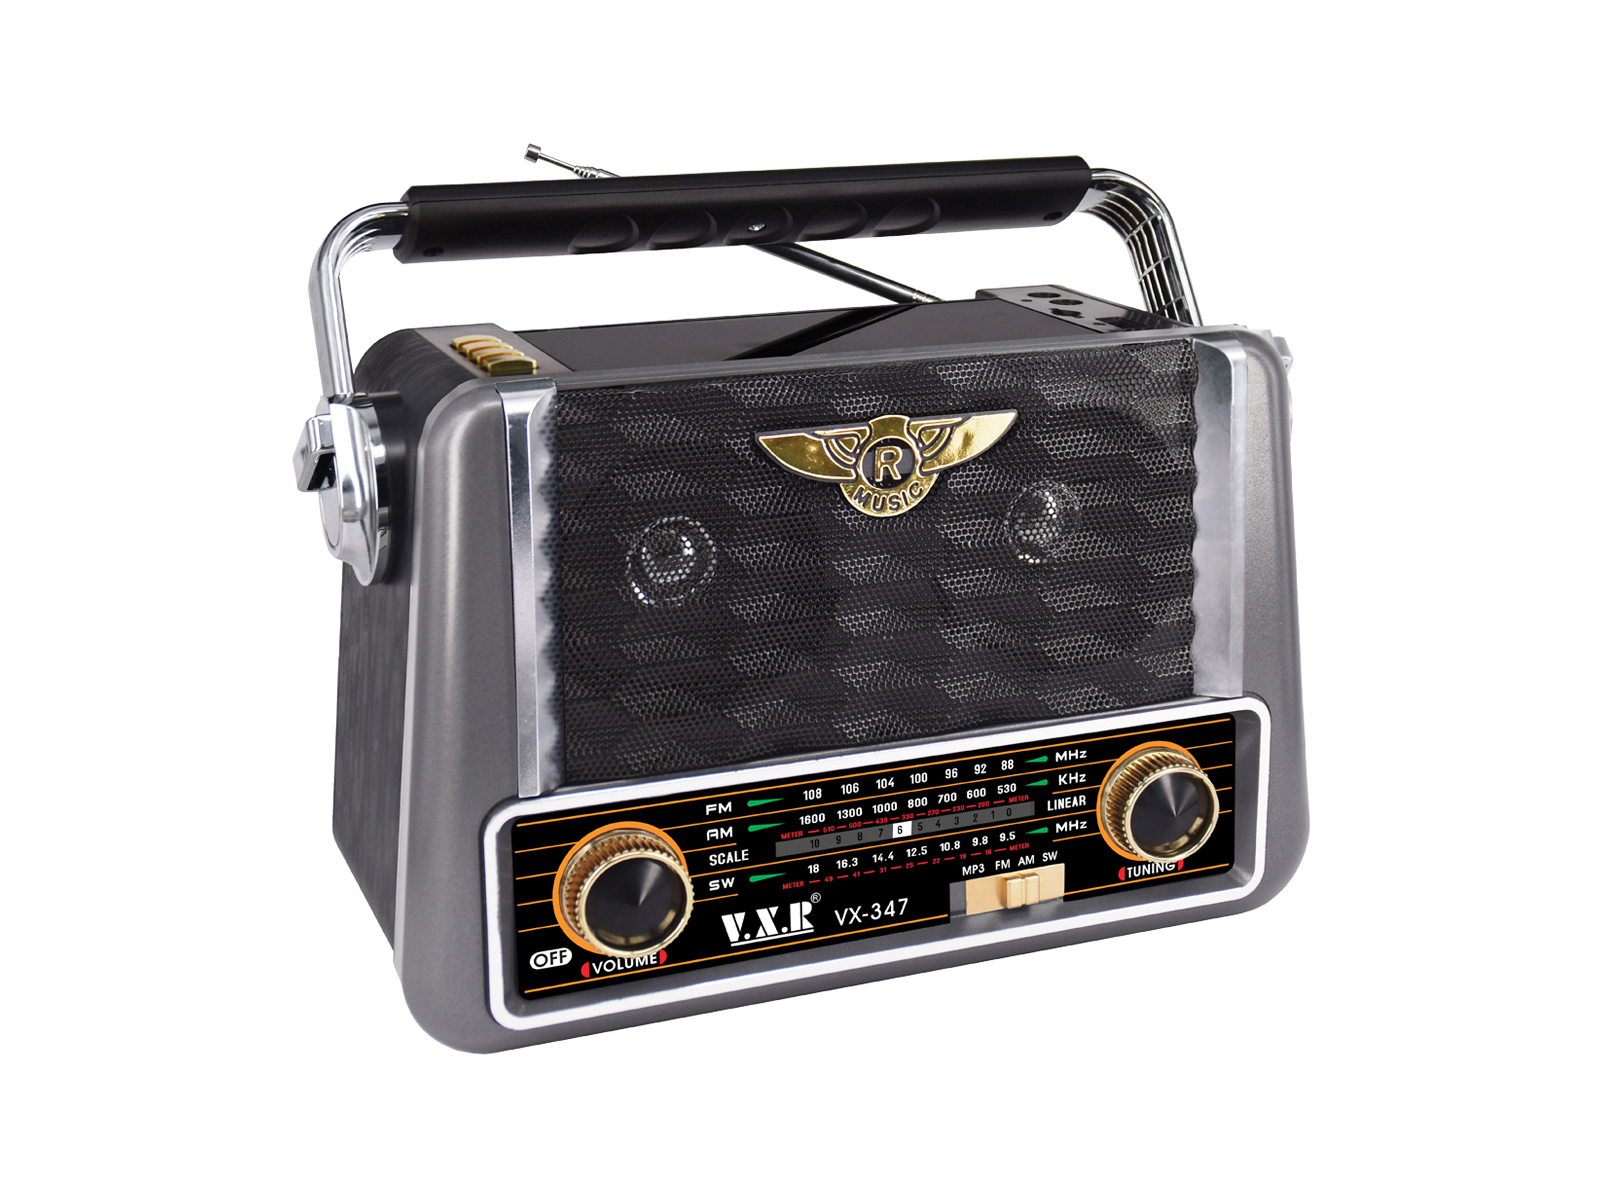 Imagen de producto Radio portatil 3 bandas 0